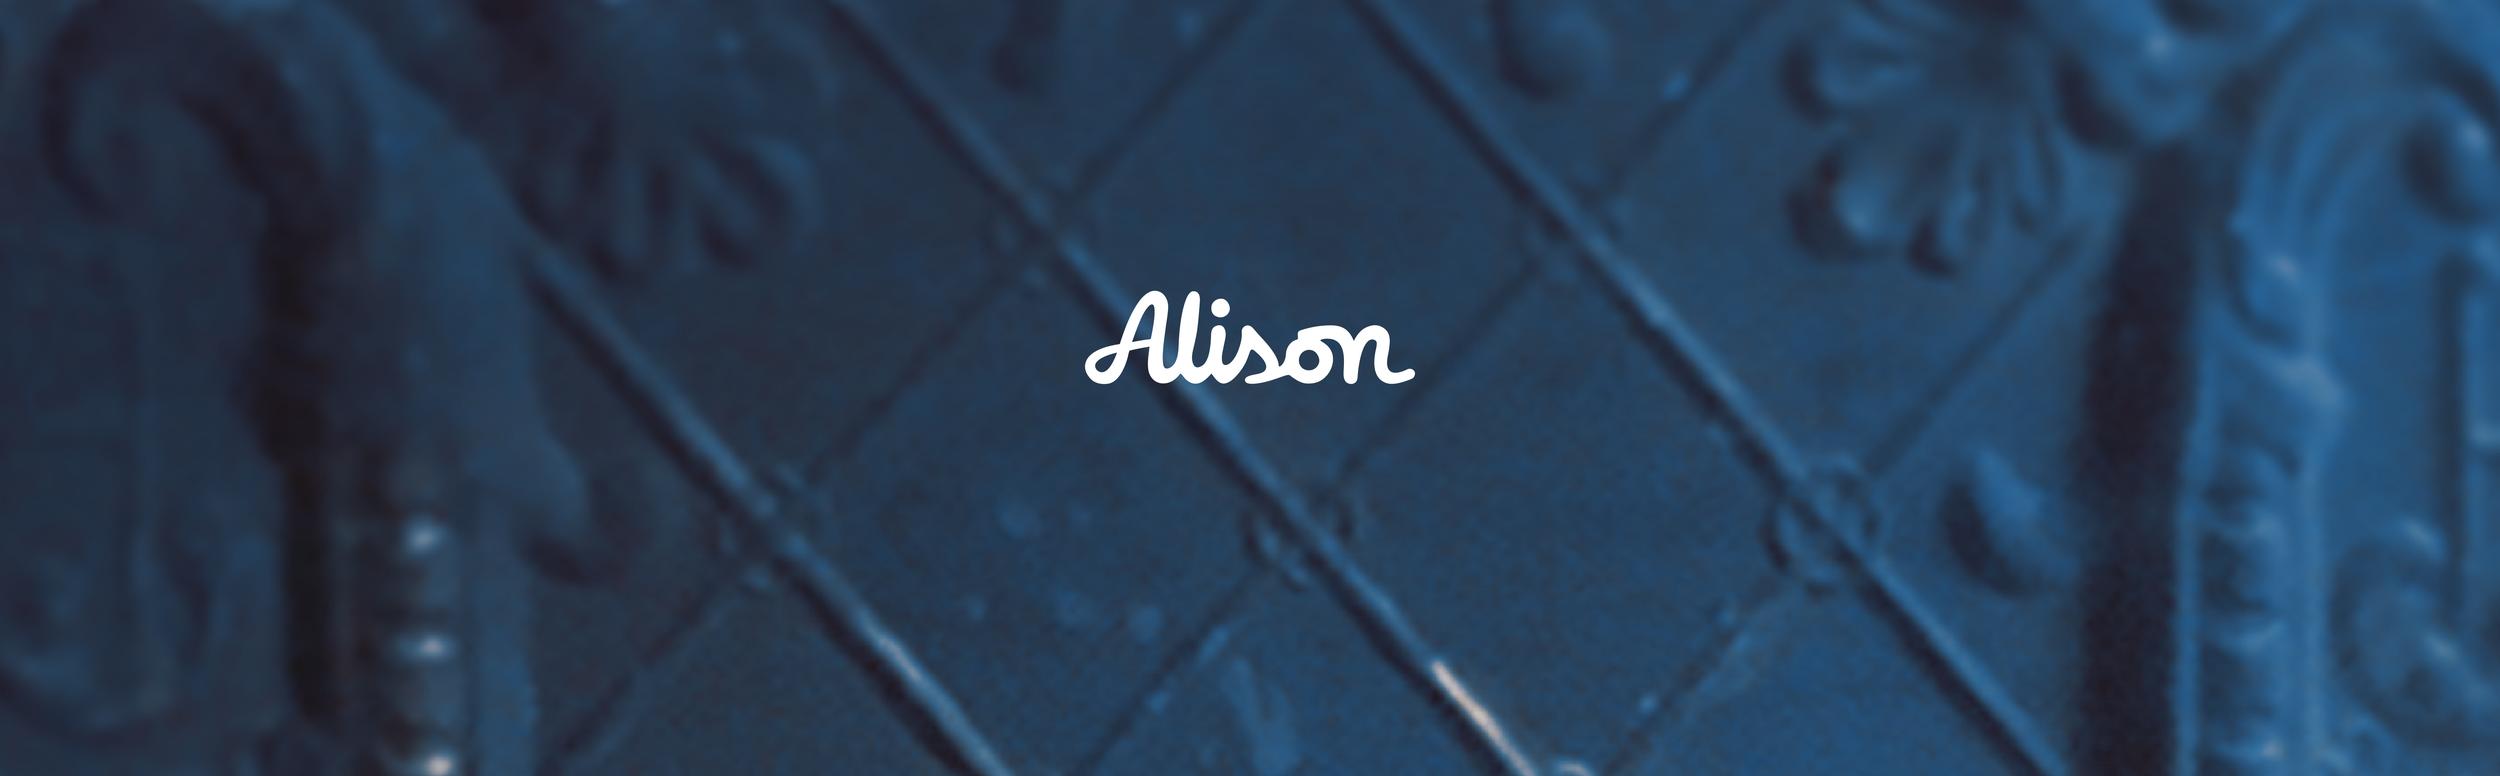 Alison_ss_Wordmark_feb_23b_-20.png